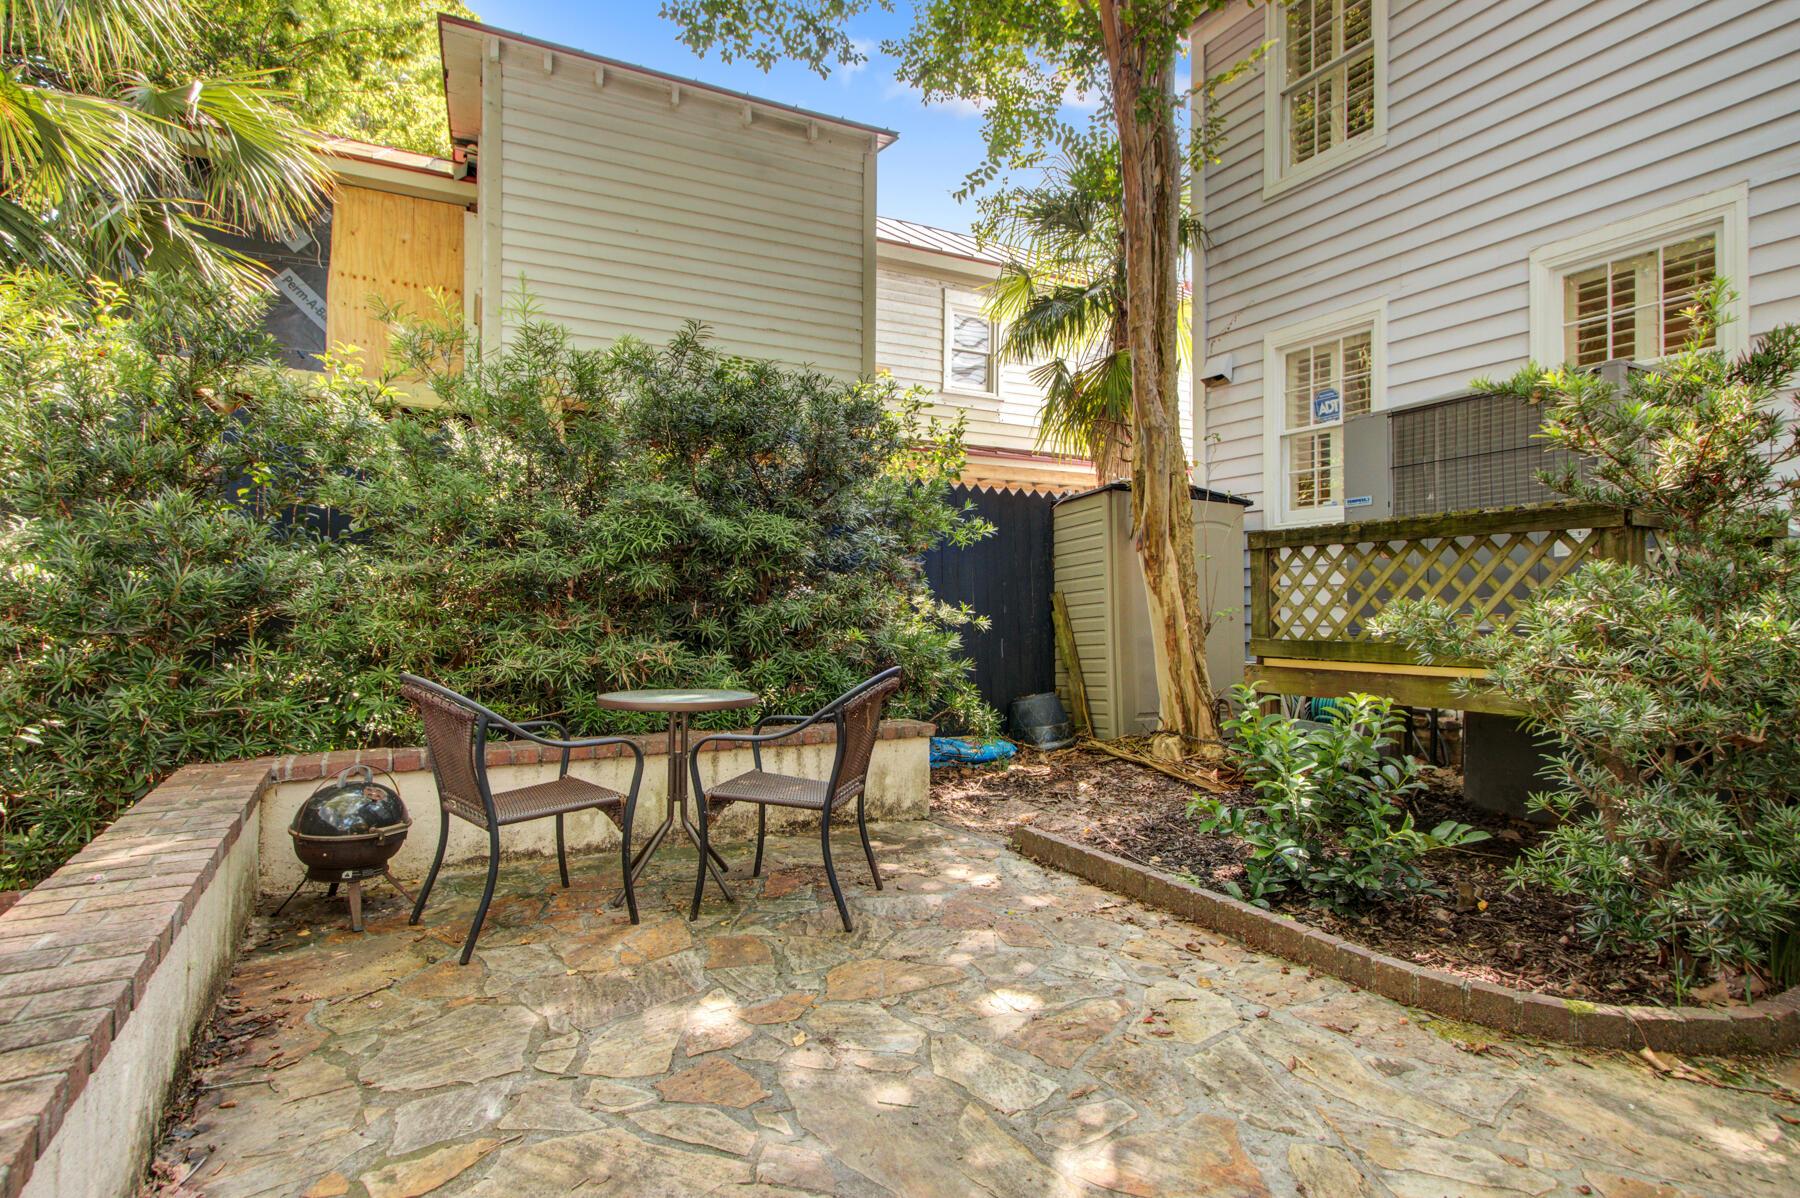 Radcliffeborough Homes For Sale - 48 Radcliffe, Charleston, SC - 23